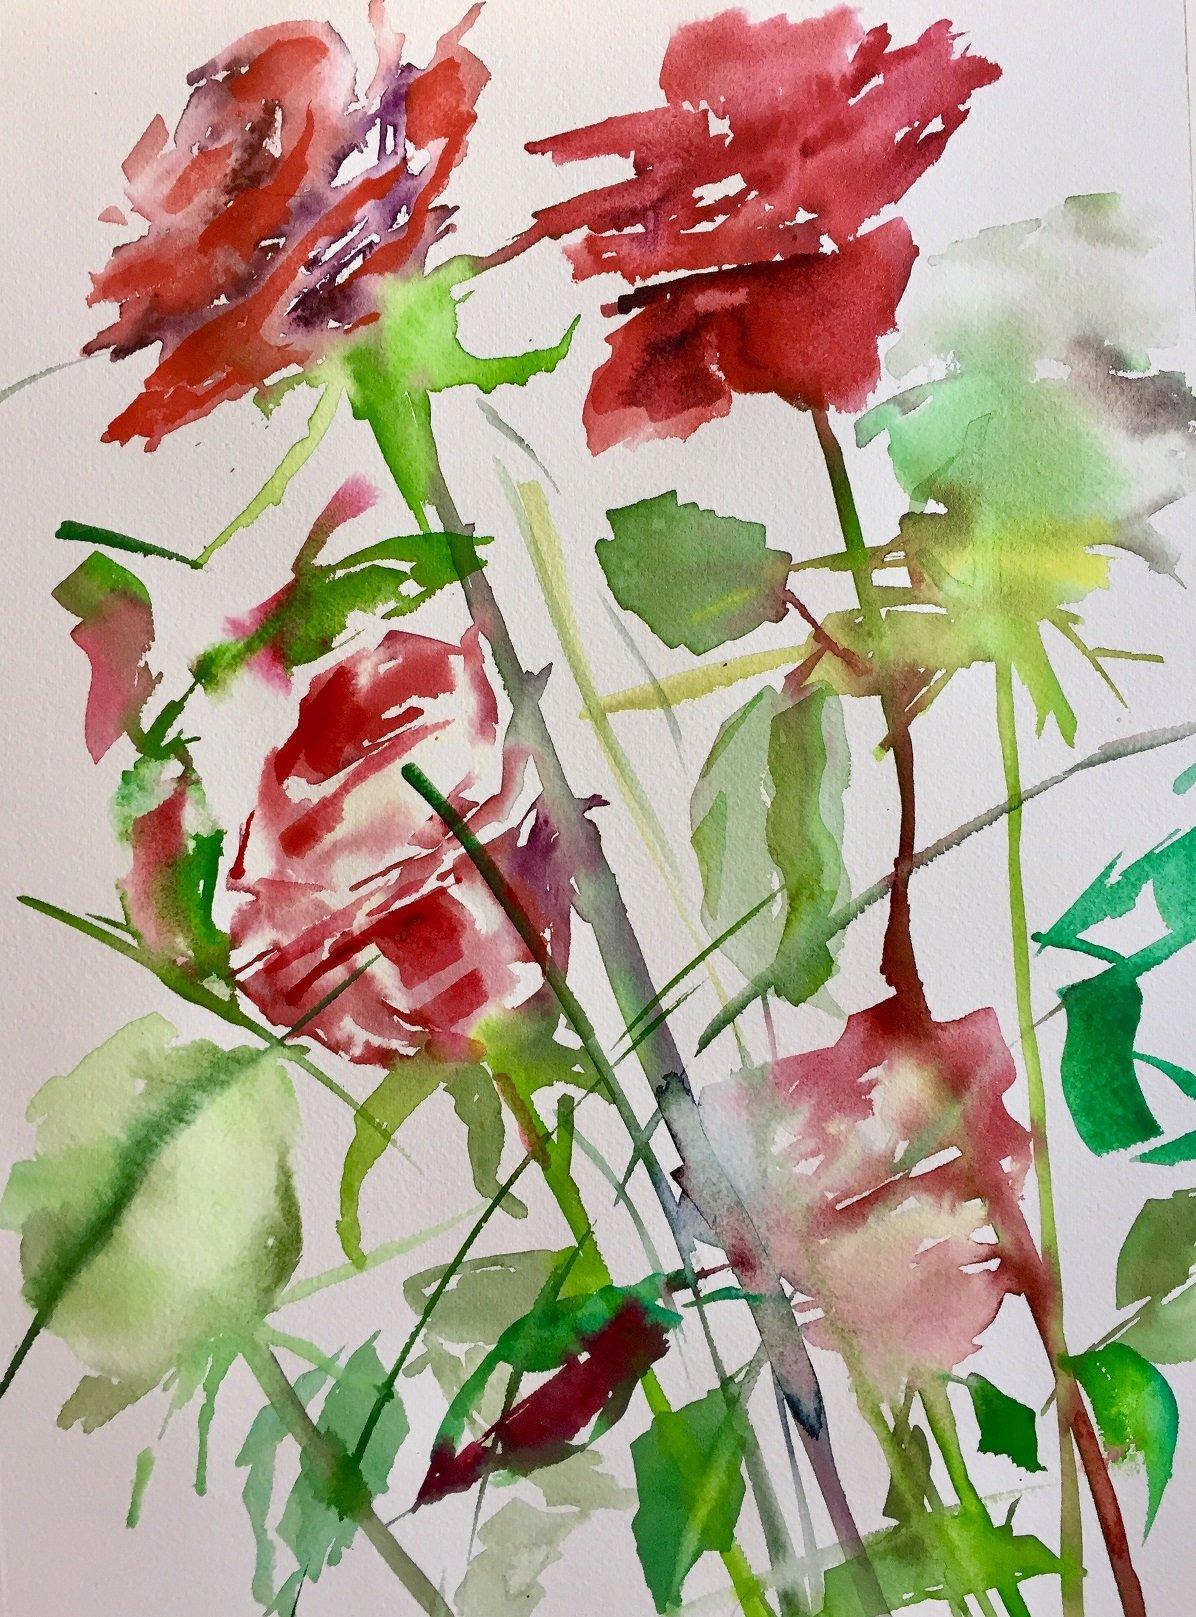 Winter Roses 9<br /> Water colour on cm 300 gms Arches<br /> 56 cm x 31cm